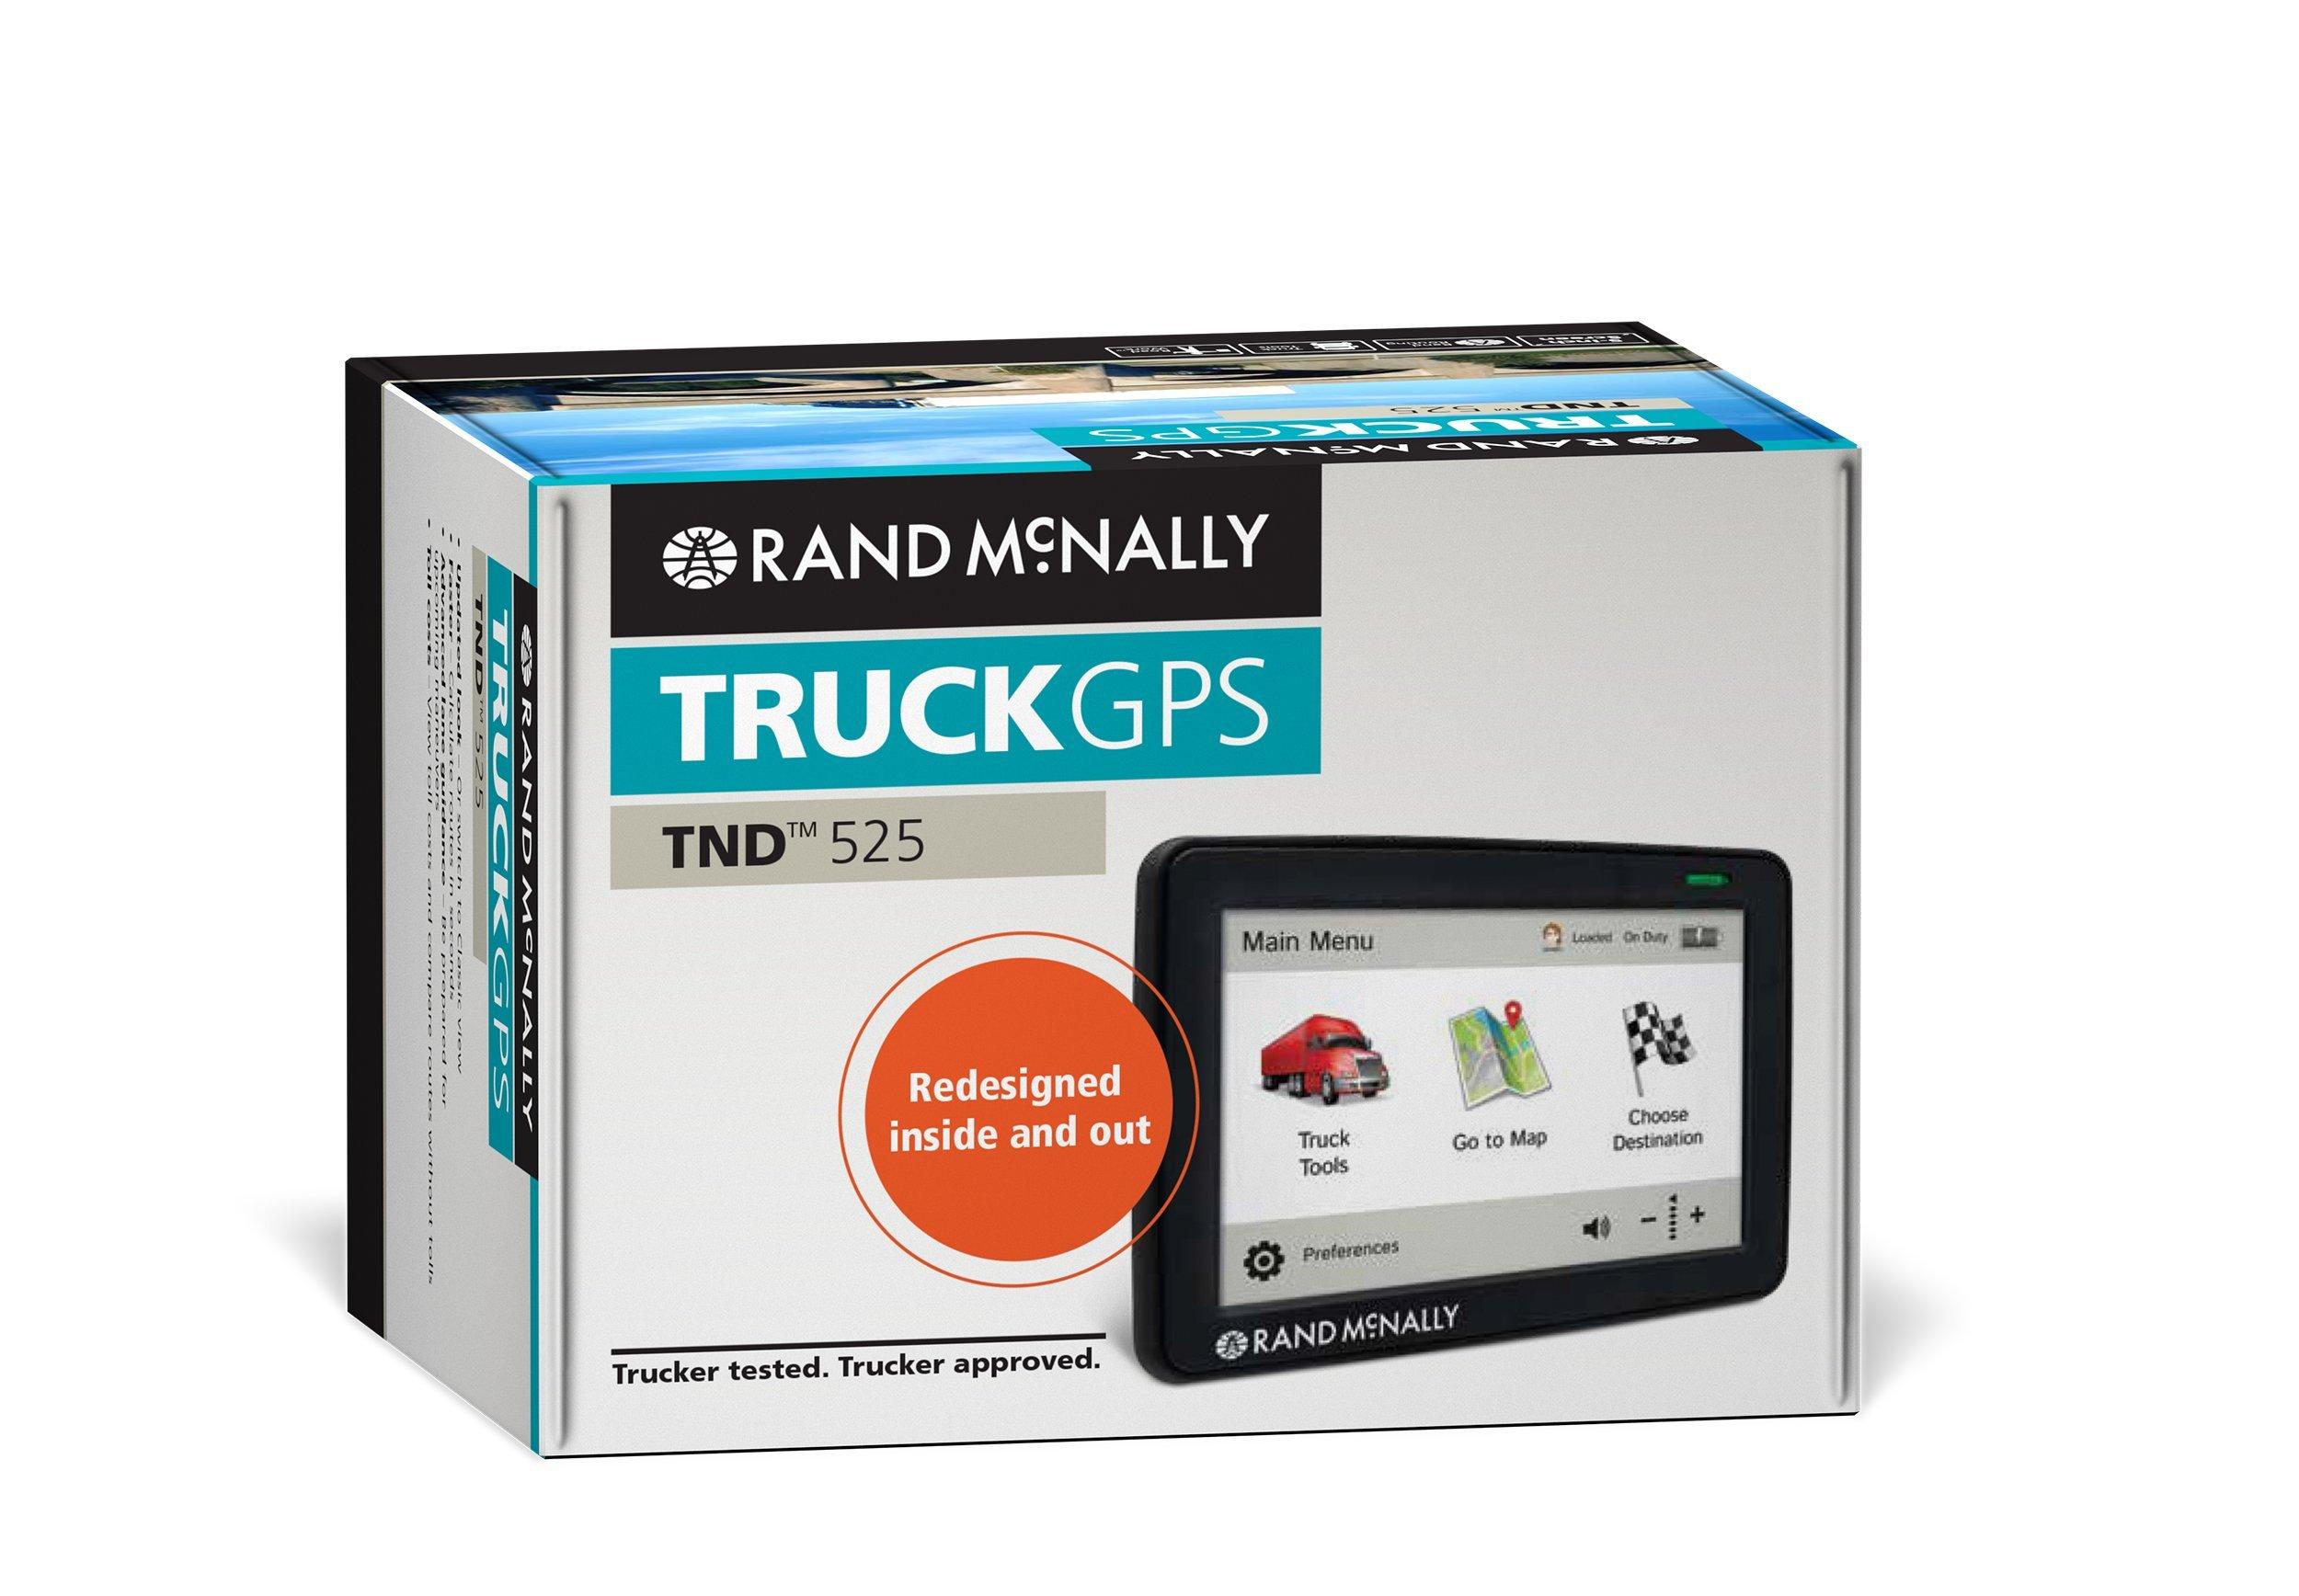 Rand McNally IntelliRoute TND 525 Truck GPS by Rand McNally